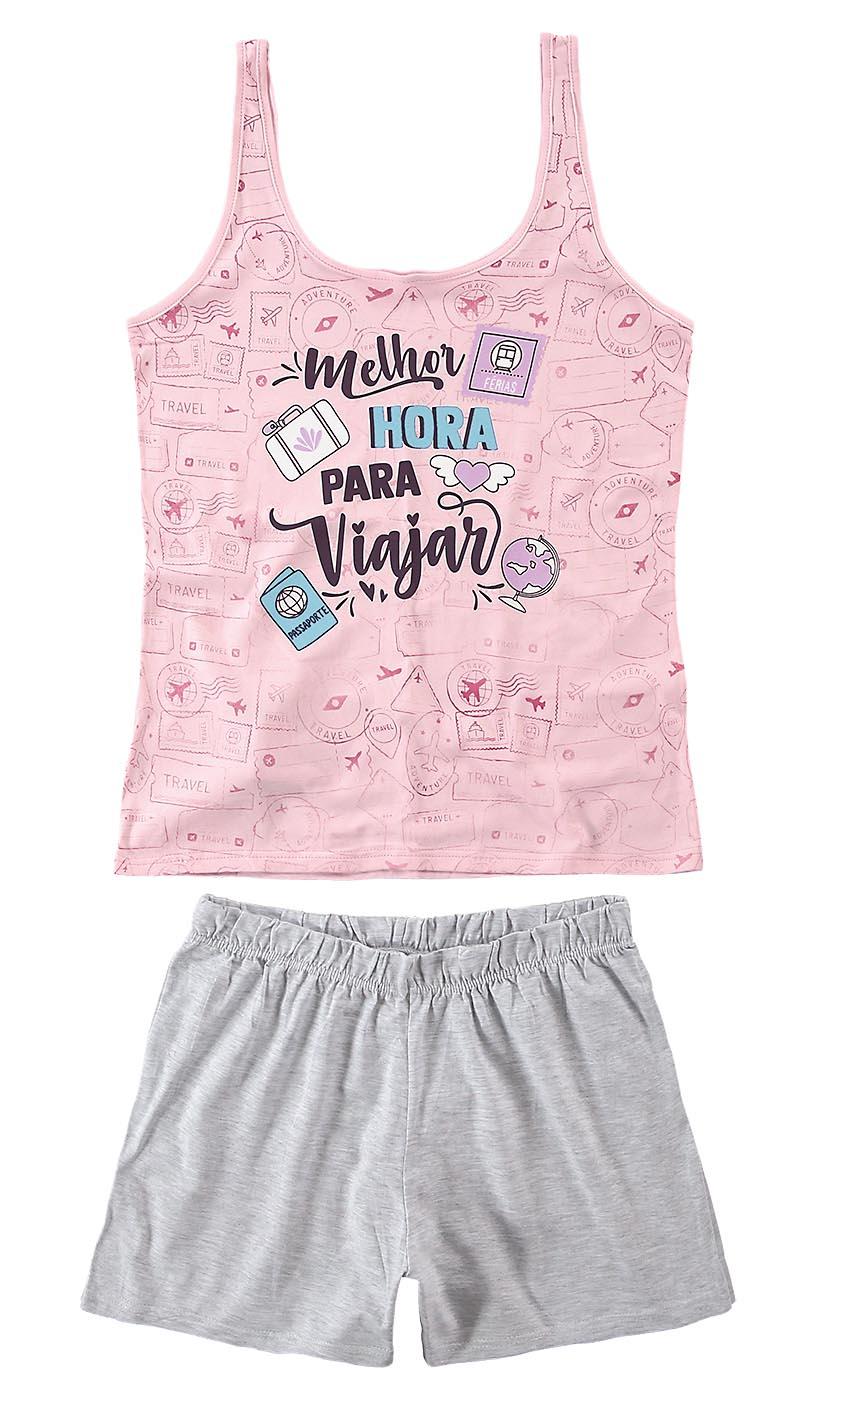 Pijama Regata Malwee - Melhor Hora Para Viajar Rosa